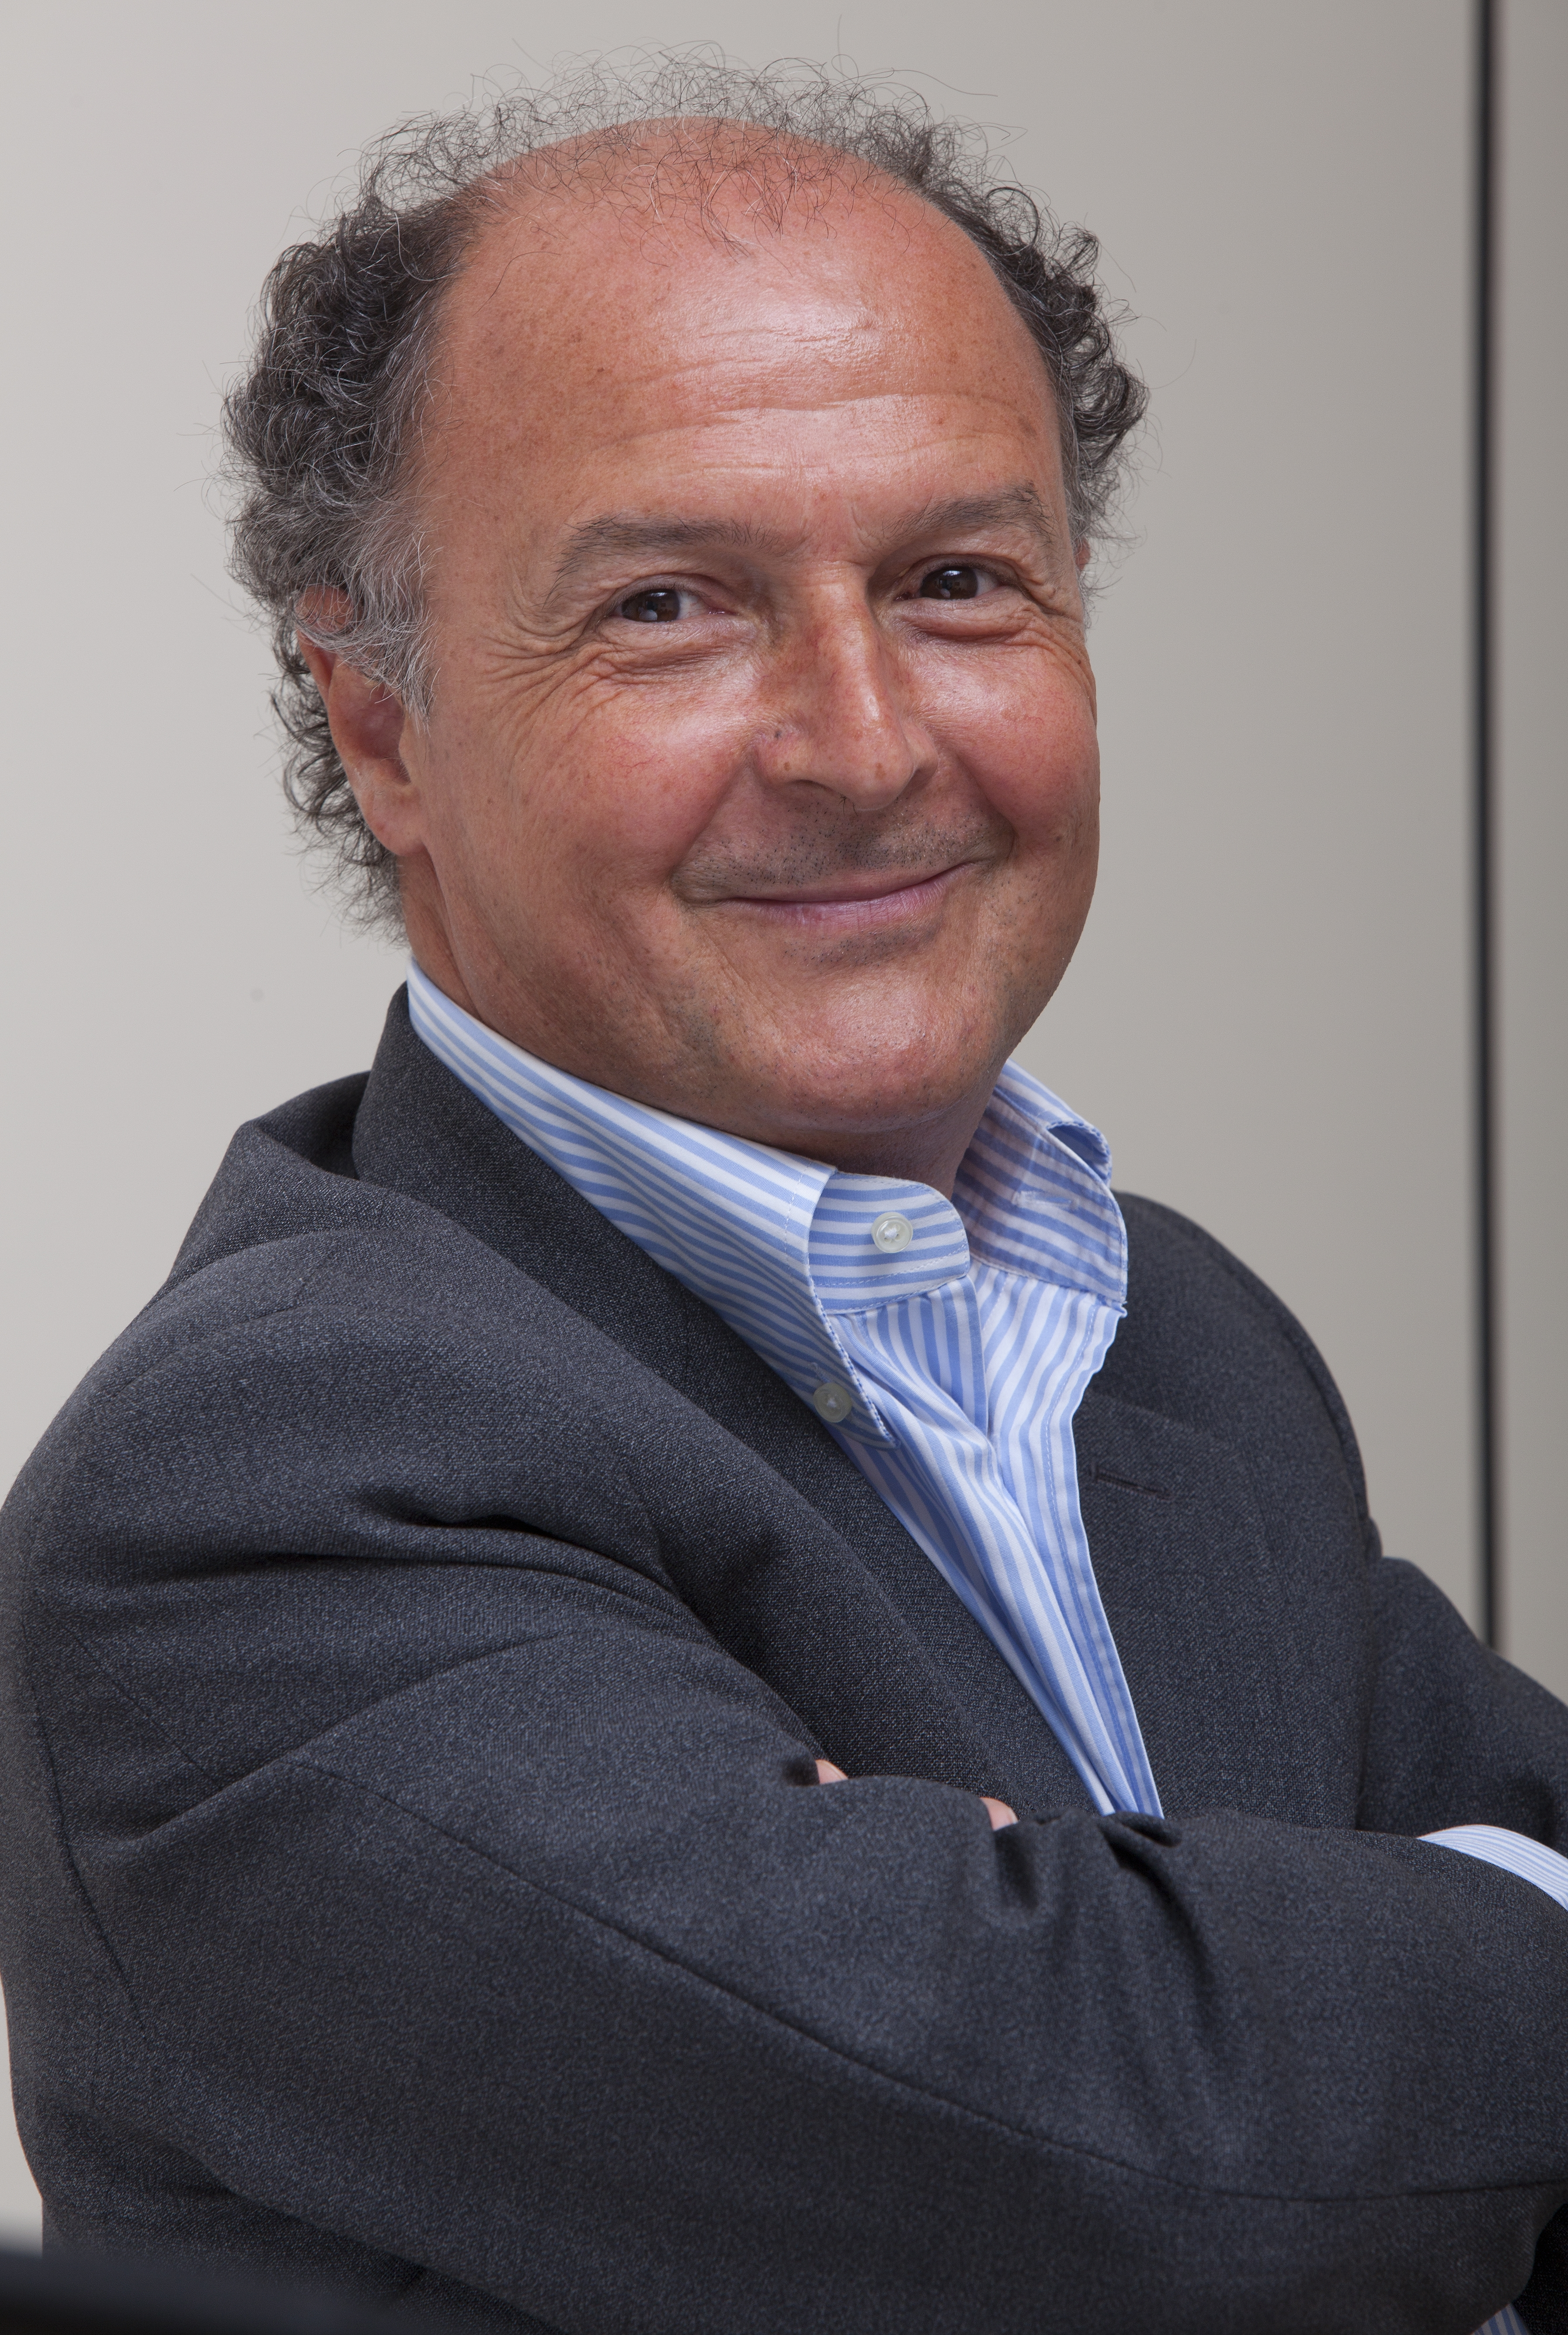 Andrea Cugnasca